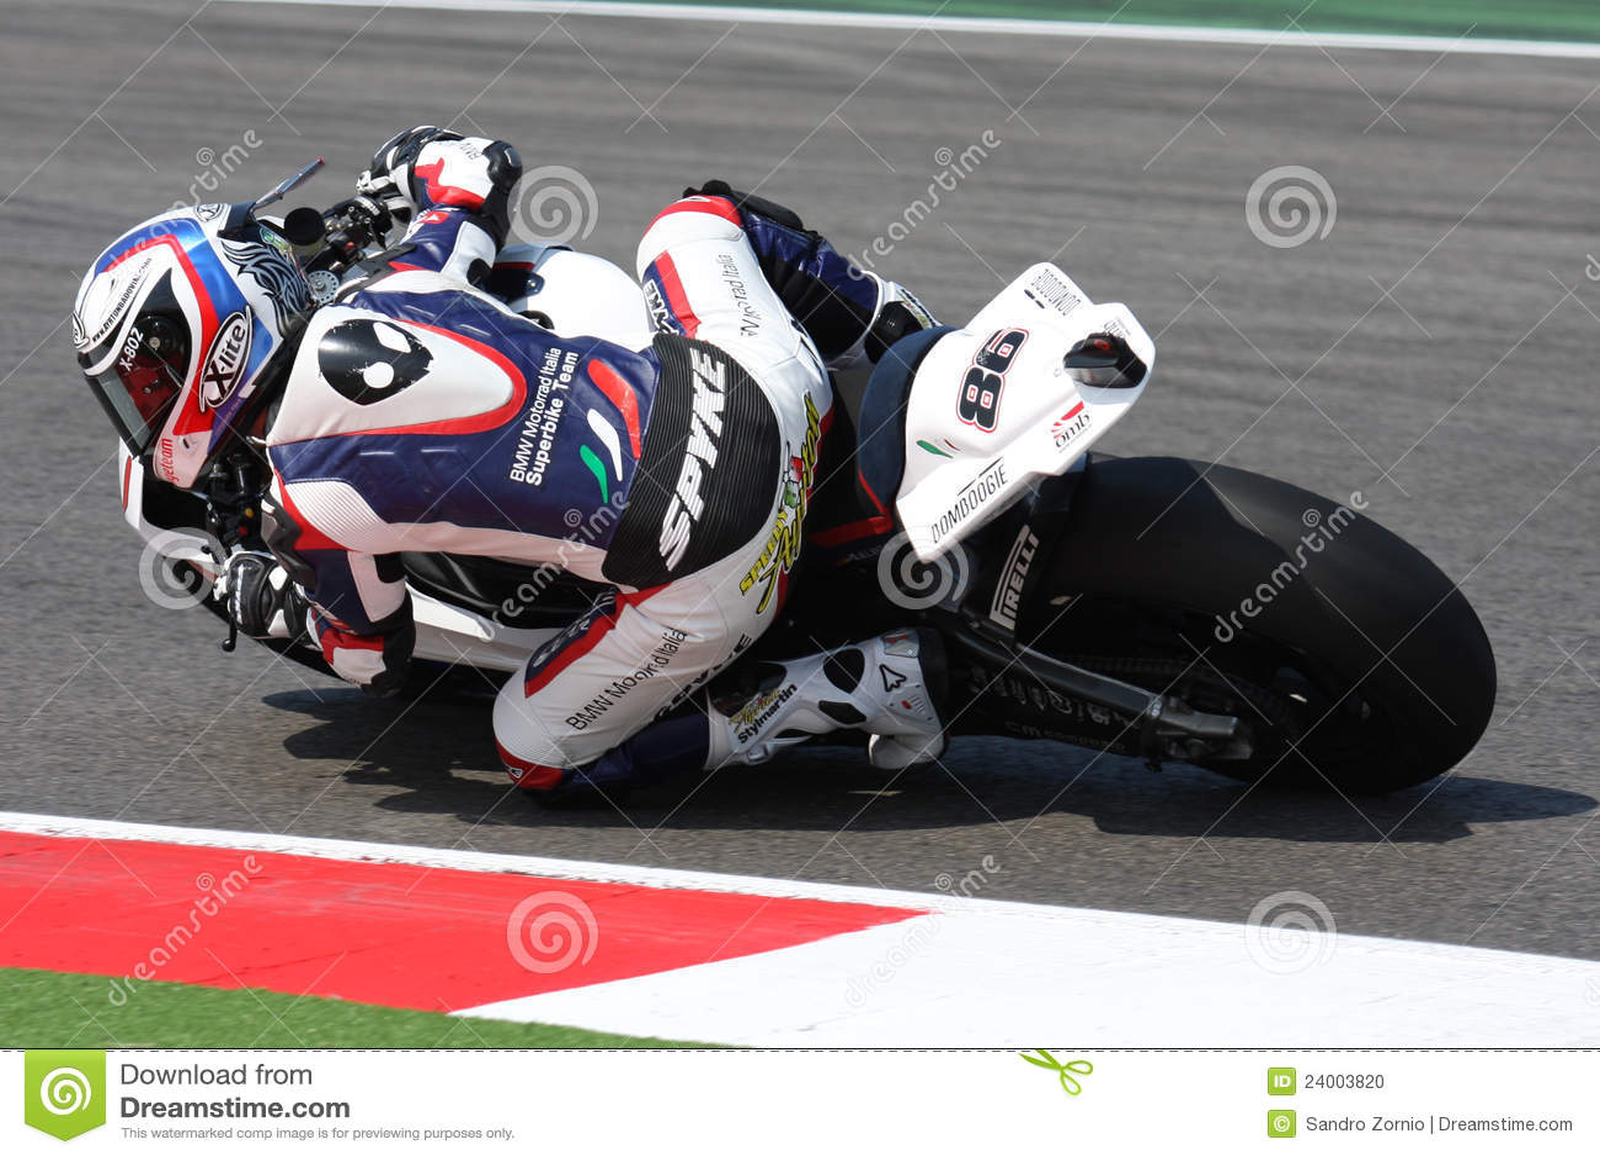 Ayrton Badovini BMW S1000 RR - BMW Motorrad